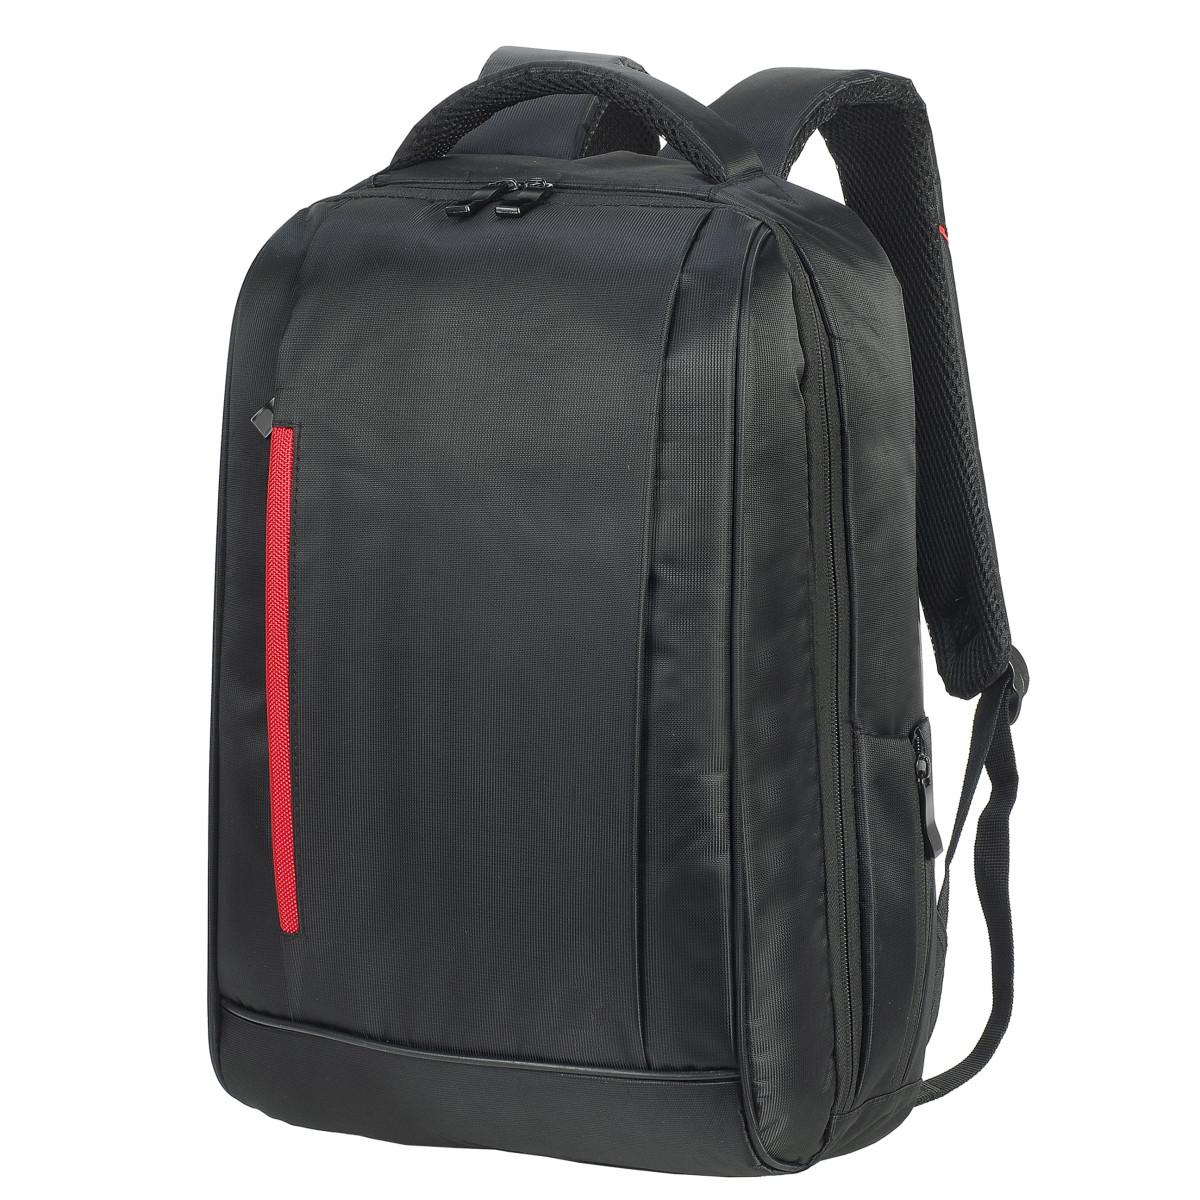 Shugon Kiel Laptop Backpack